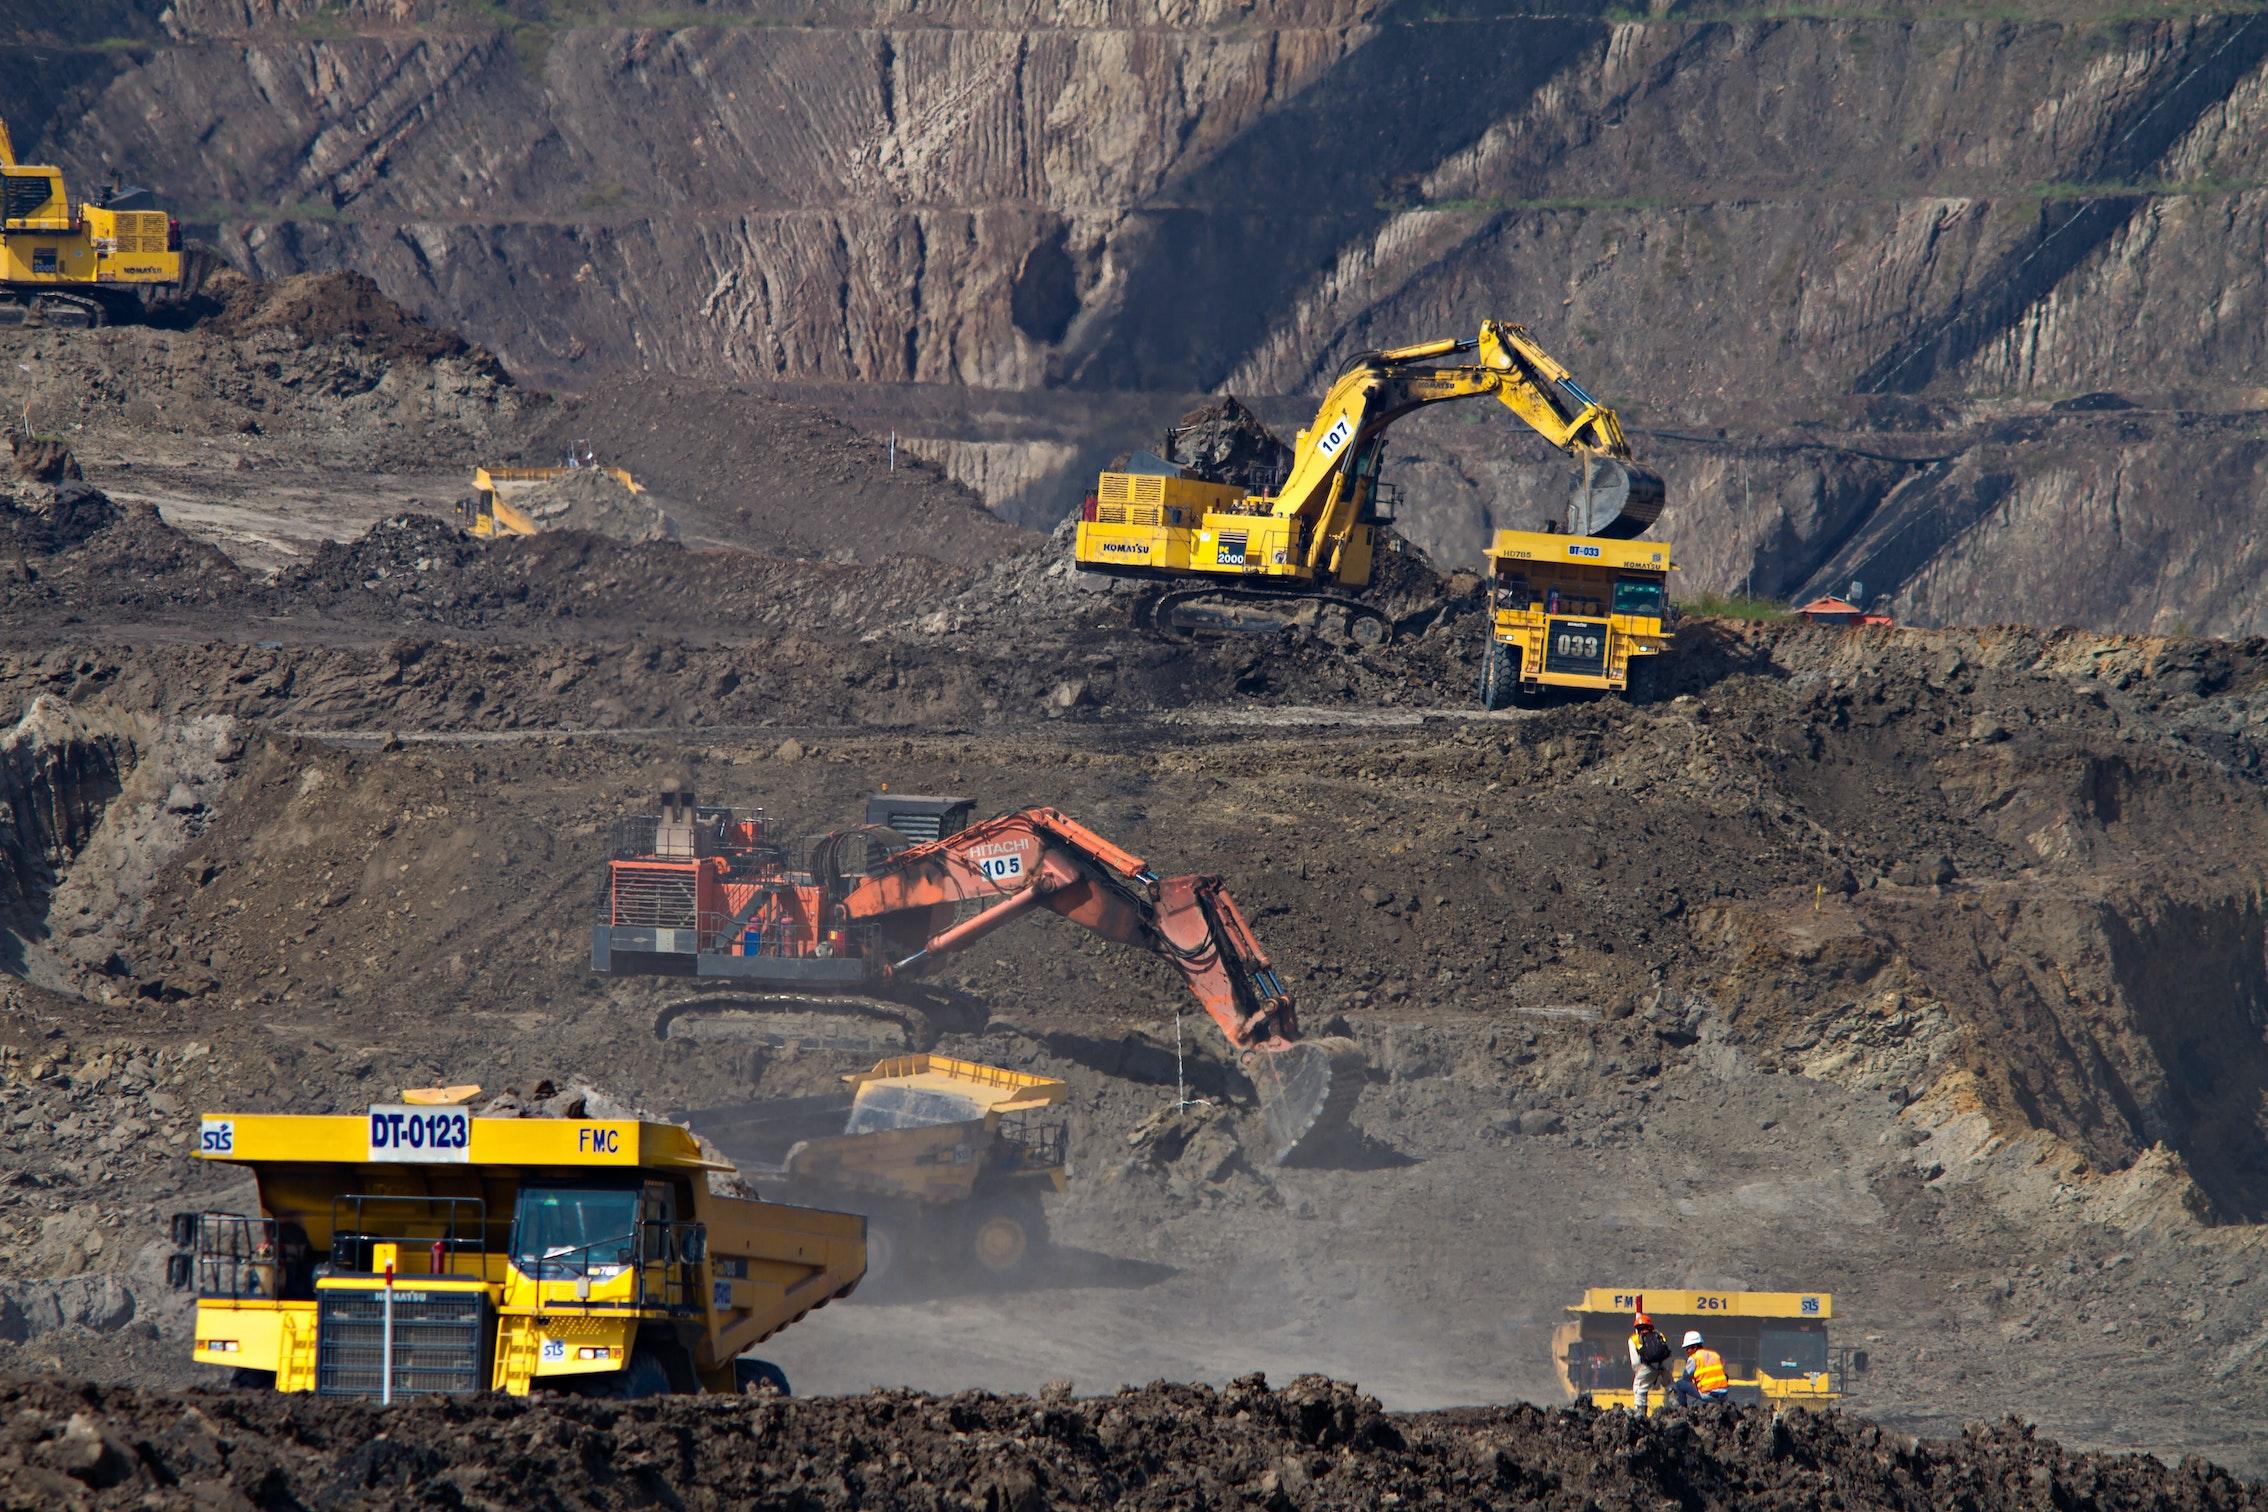 More for Queenslanders, less for mining billionaires